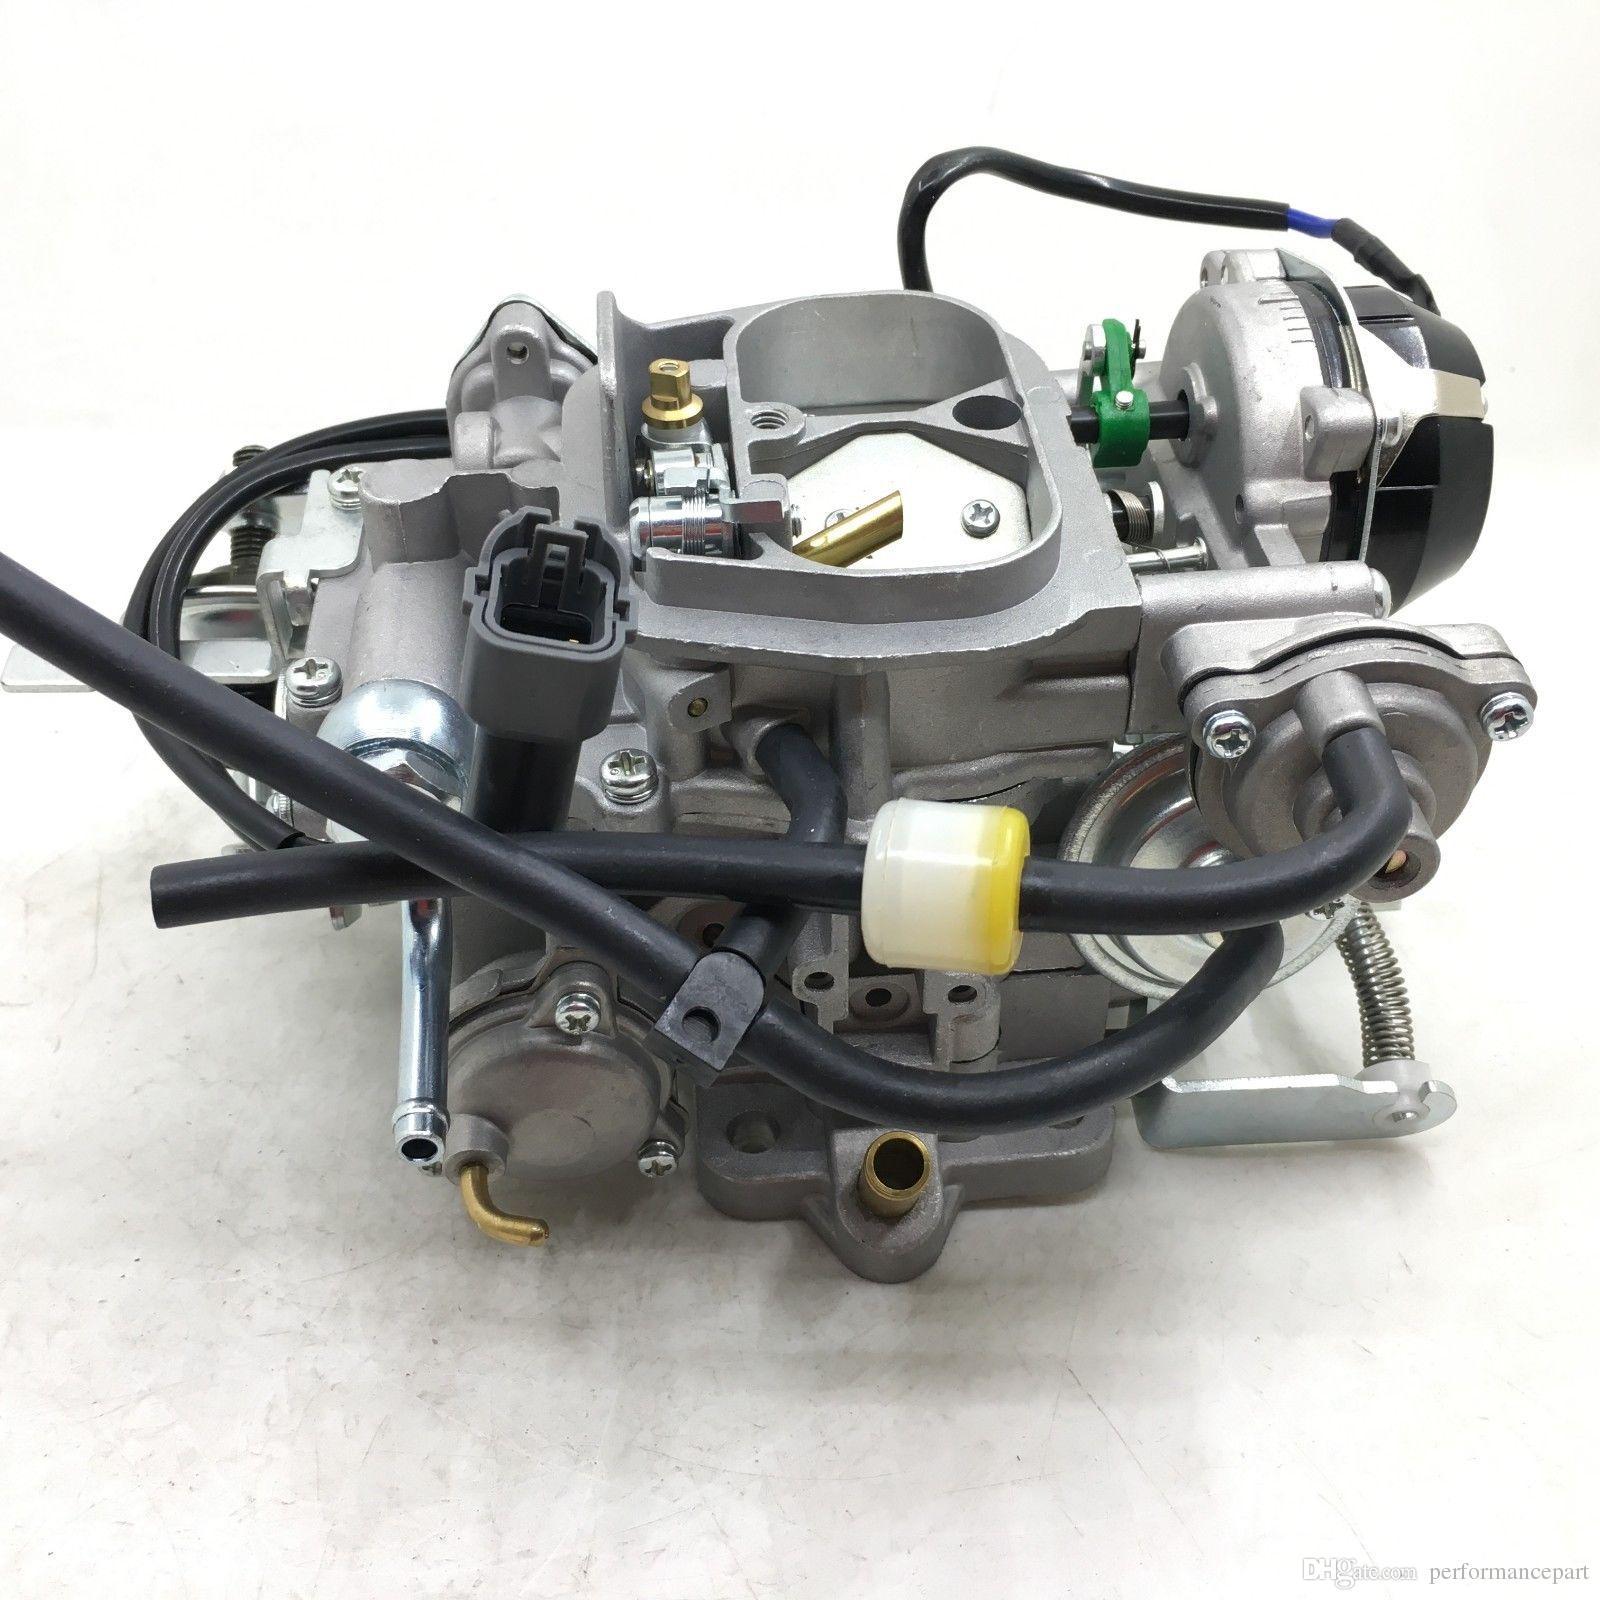 hight resolution of 2019 car carburator fit for toyota 22r 1984 1997 sr5 4runner landcruiser pickup 35481 from performancepart 123 61 dhgate com